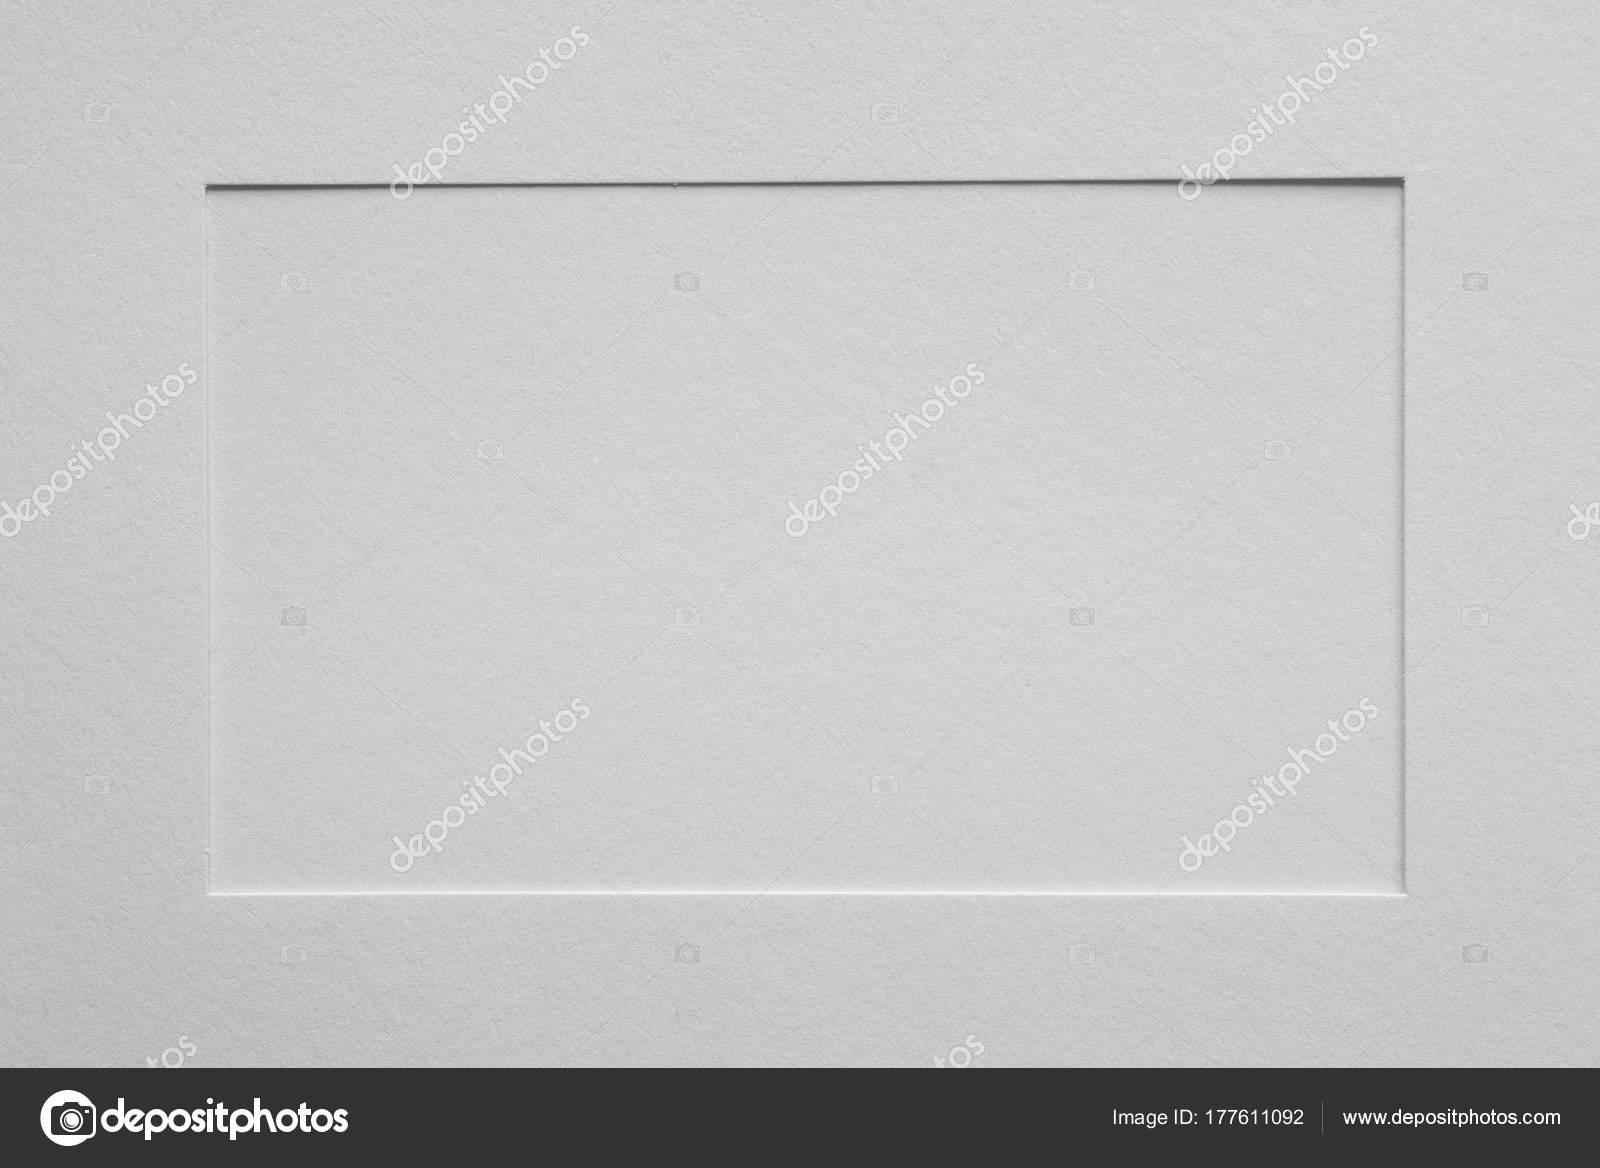 blanco papel vacío cuadro marco picaporte — Foto de stock © aga77ta ...